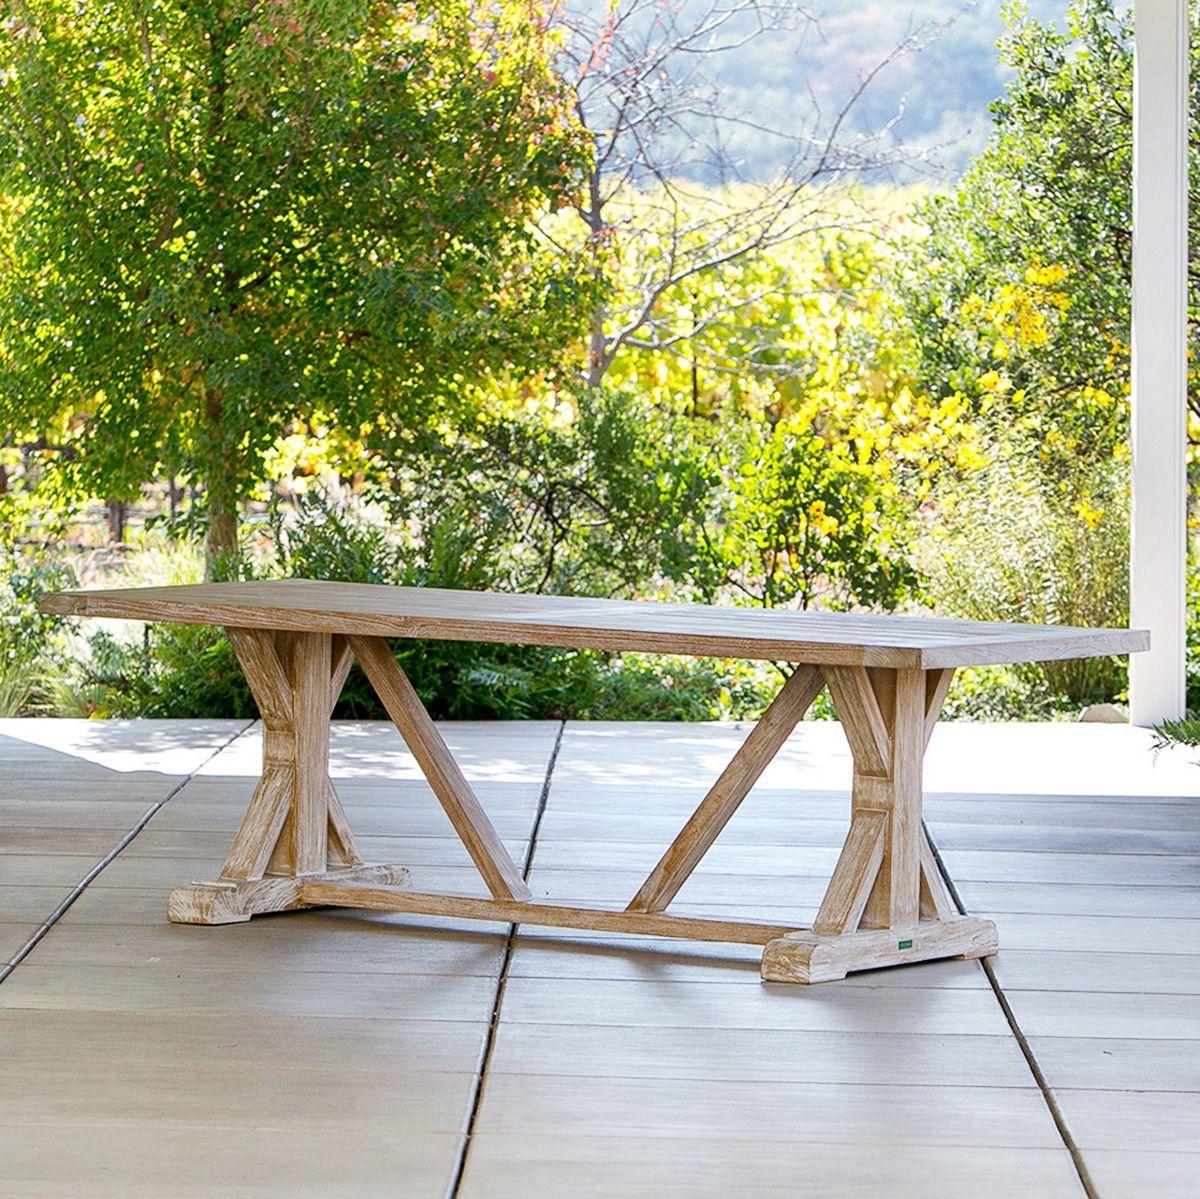 Farmhous Beam Table Teak Outdoor Furniture Terra Patio Teak Outdoor Furniture Outdoor Dining Furniture Teak Outdoor